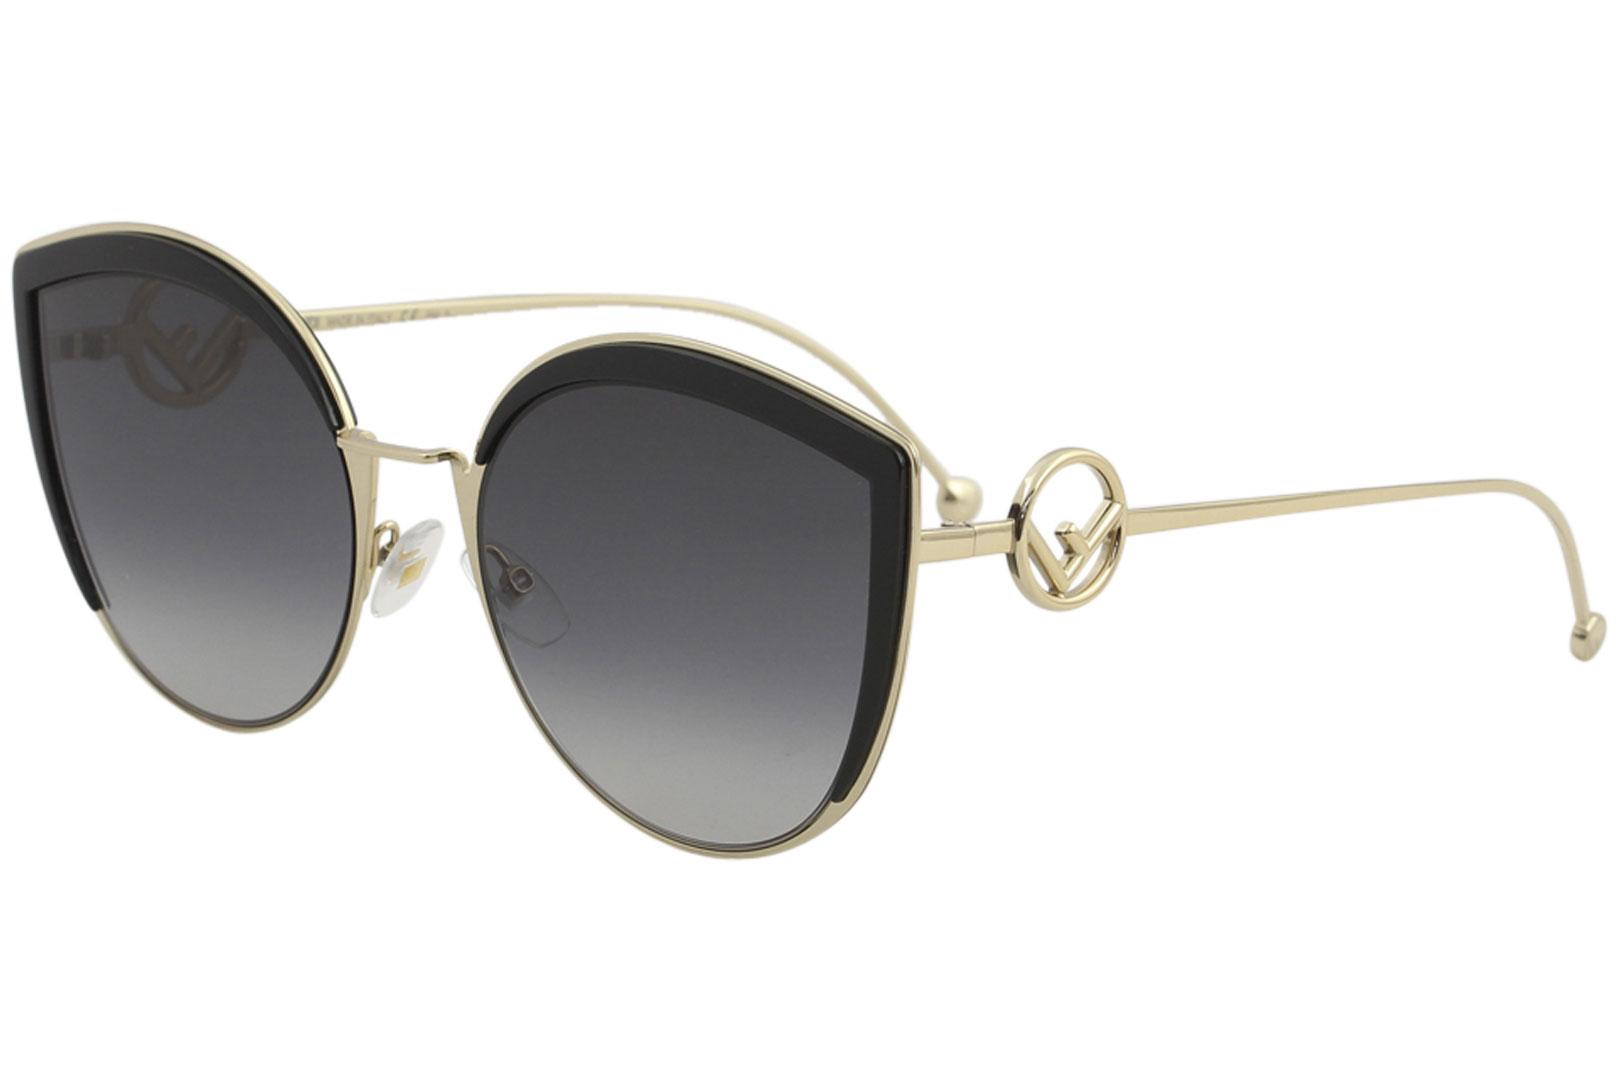 Fendi Women's FF0290/S FF/0290/S Fashion Cat Eye Sunglasses